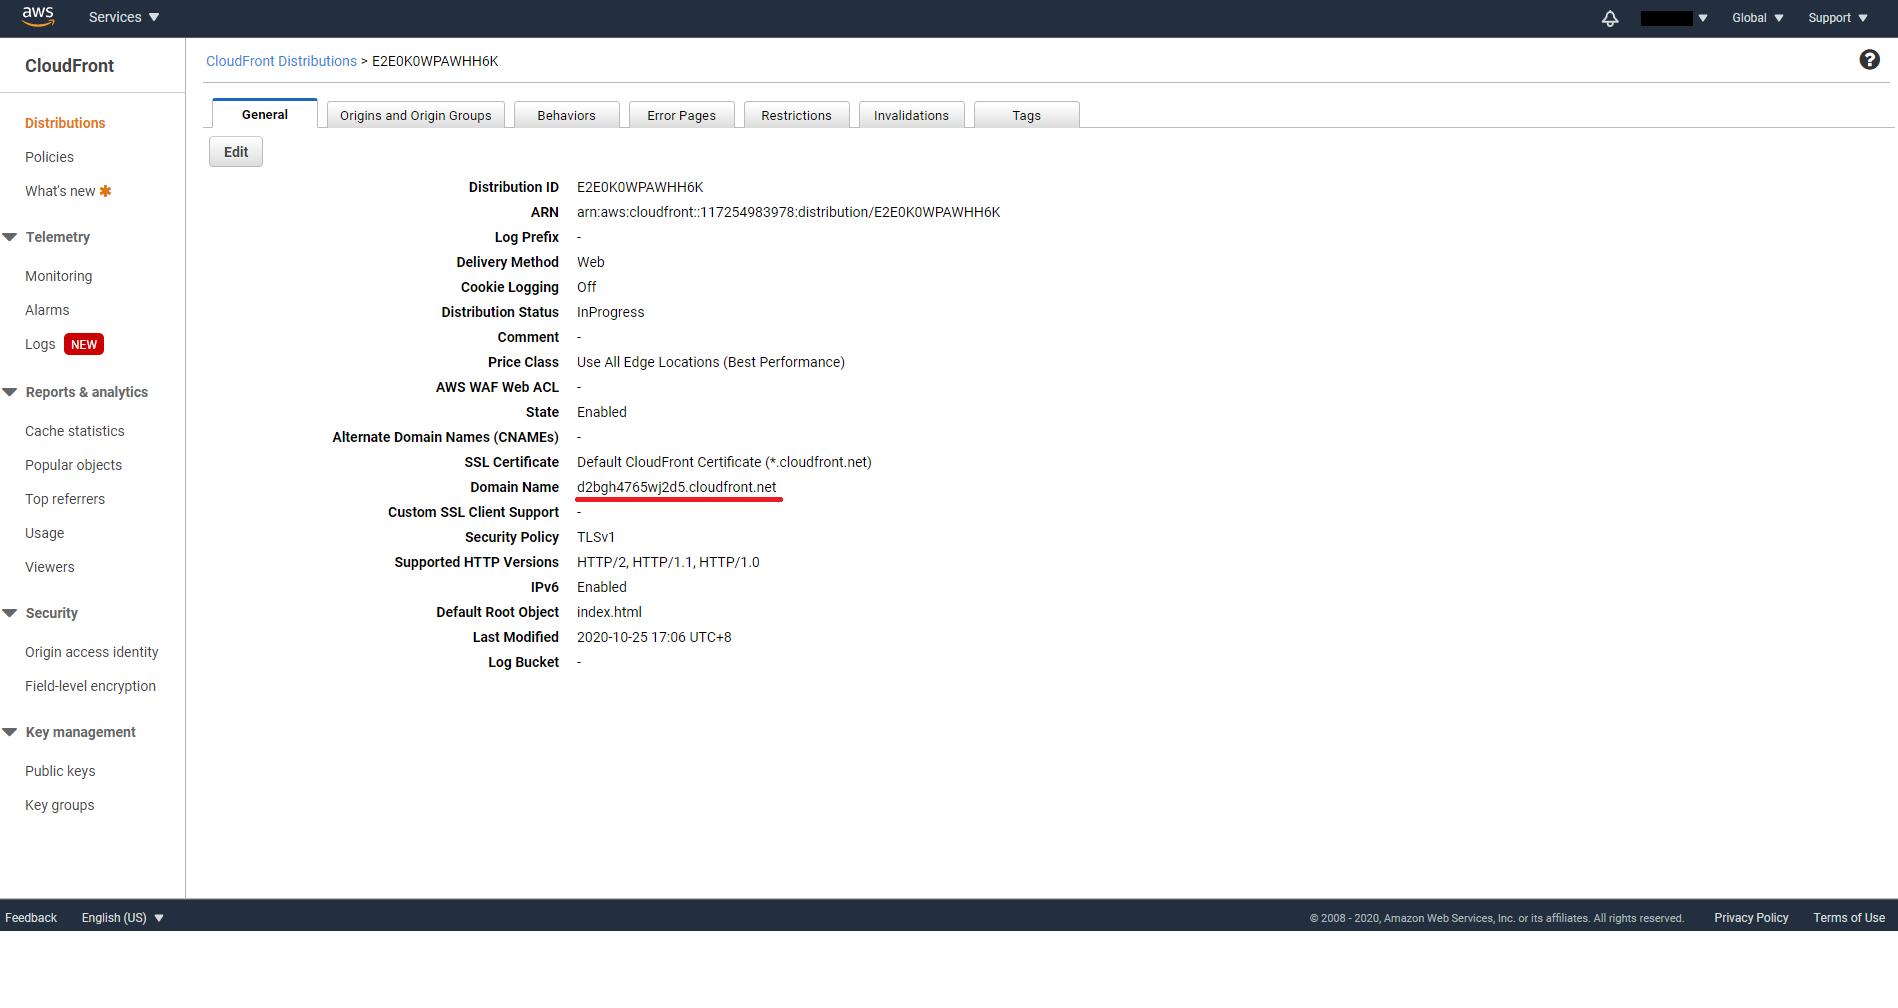 CloudFront domain name